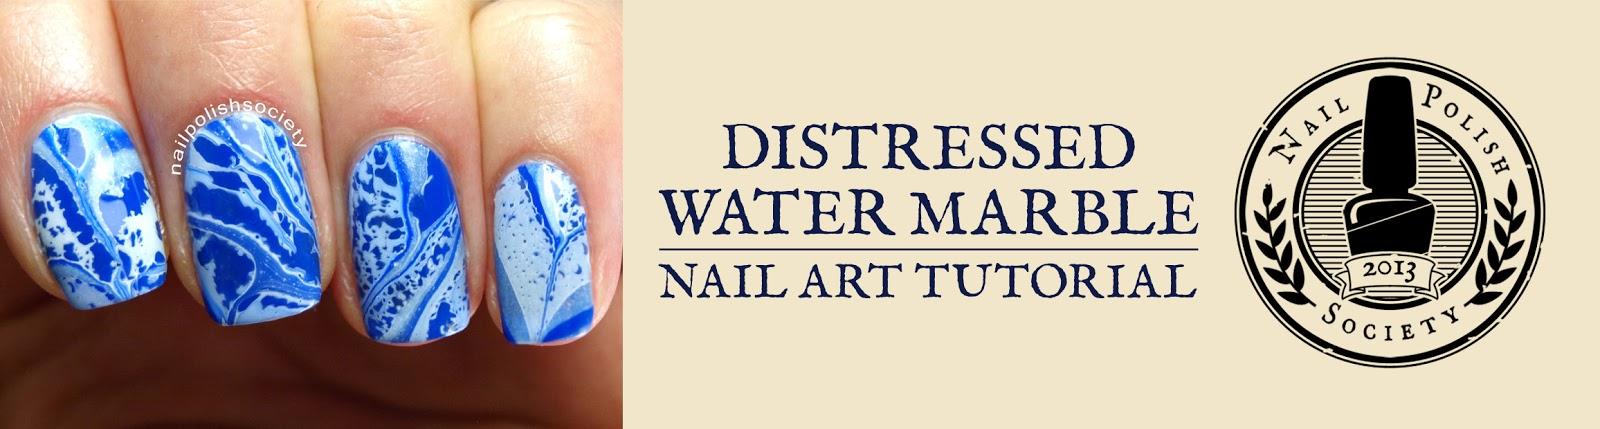 Nail Polish Society Tutorial Distressed Water Marble